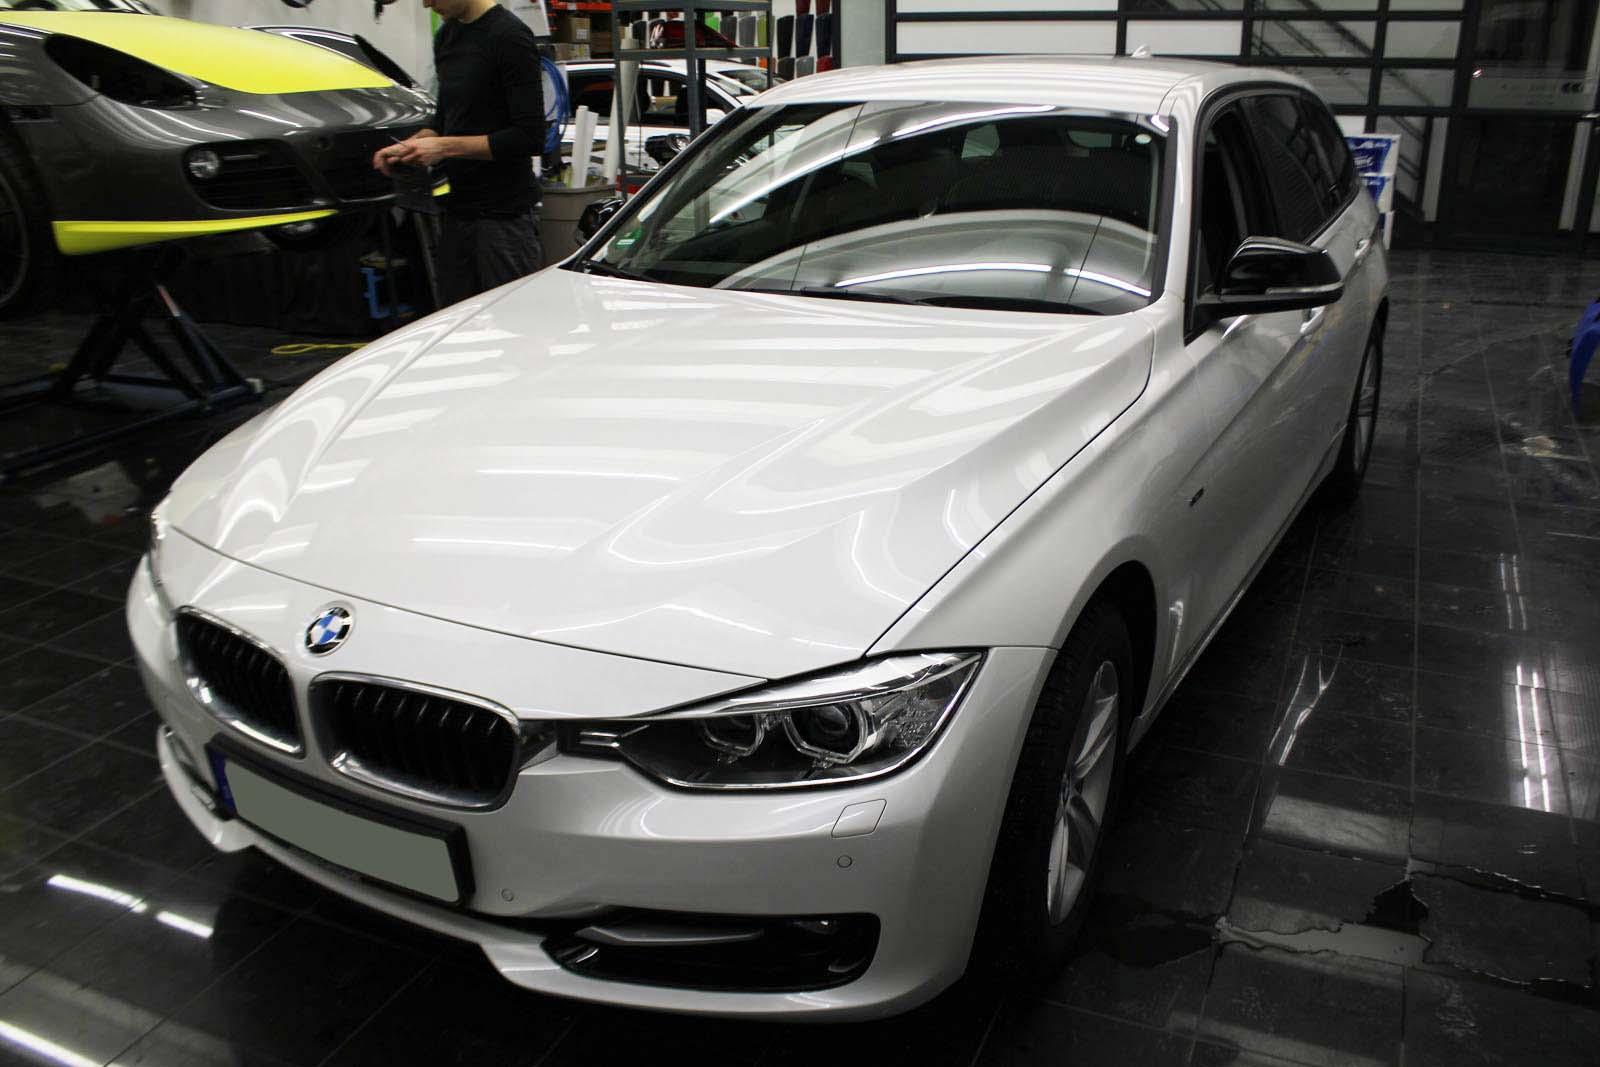 BMW_3ER_RALLYESTREIFEN_WEISS_GRUEN_MATT_MIT_BRANDING_001